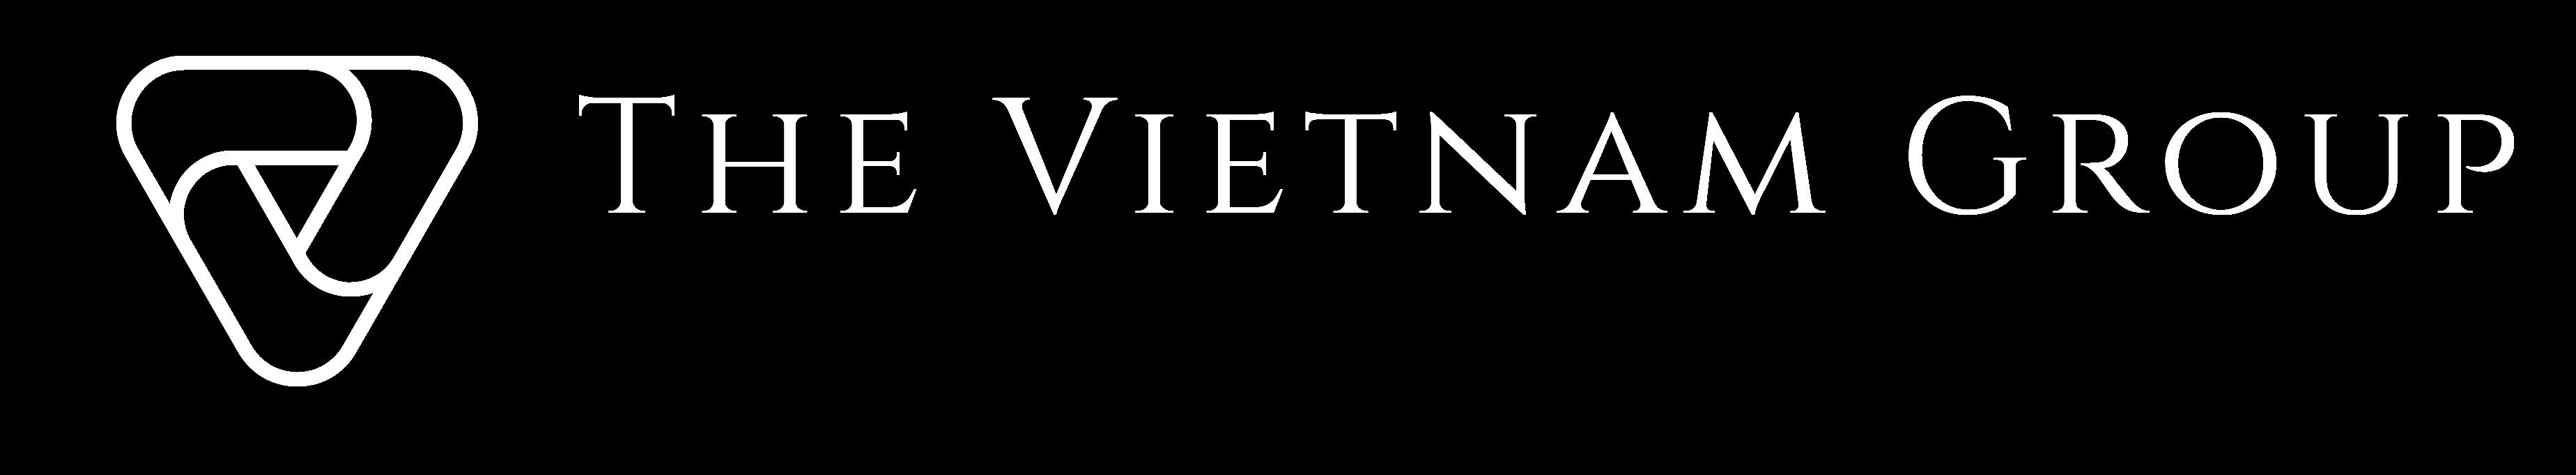 The Vietnam Group